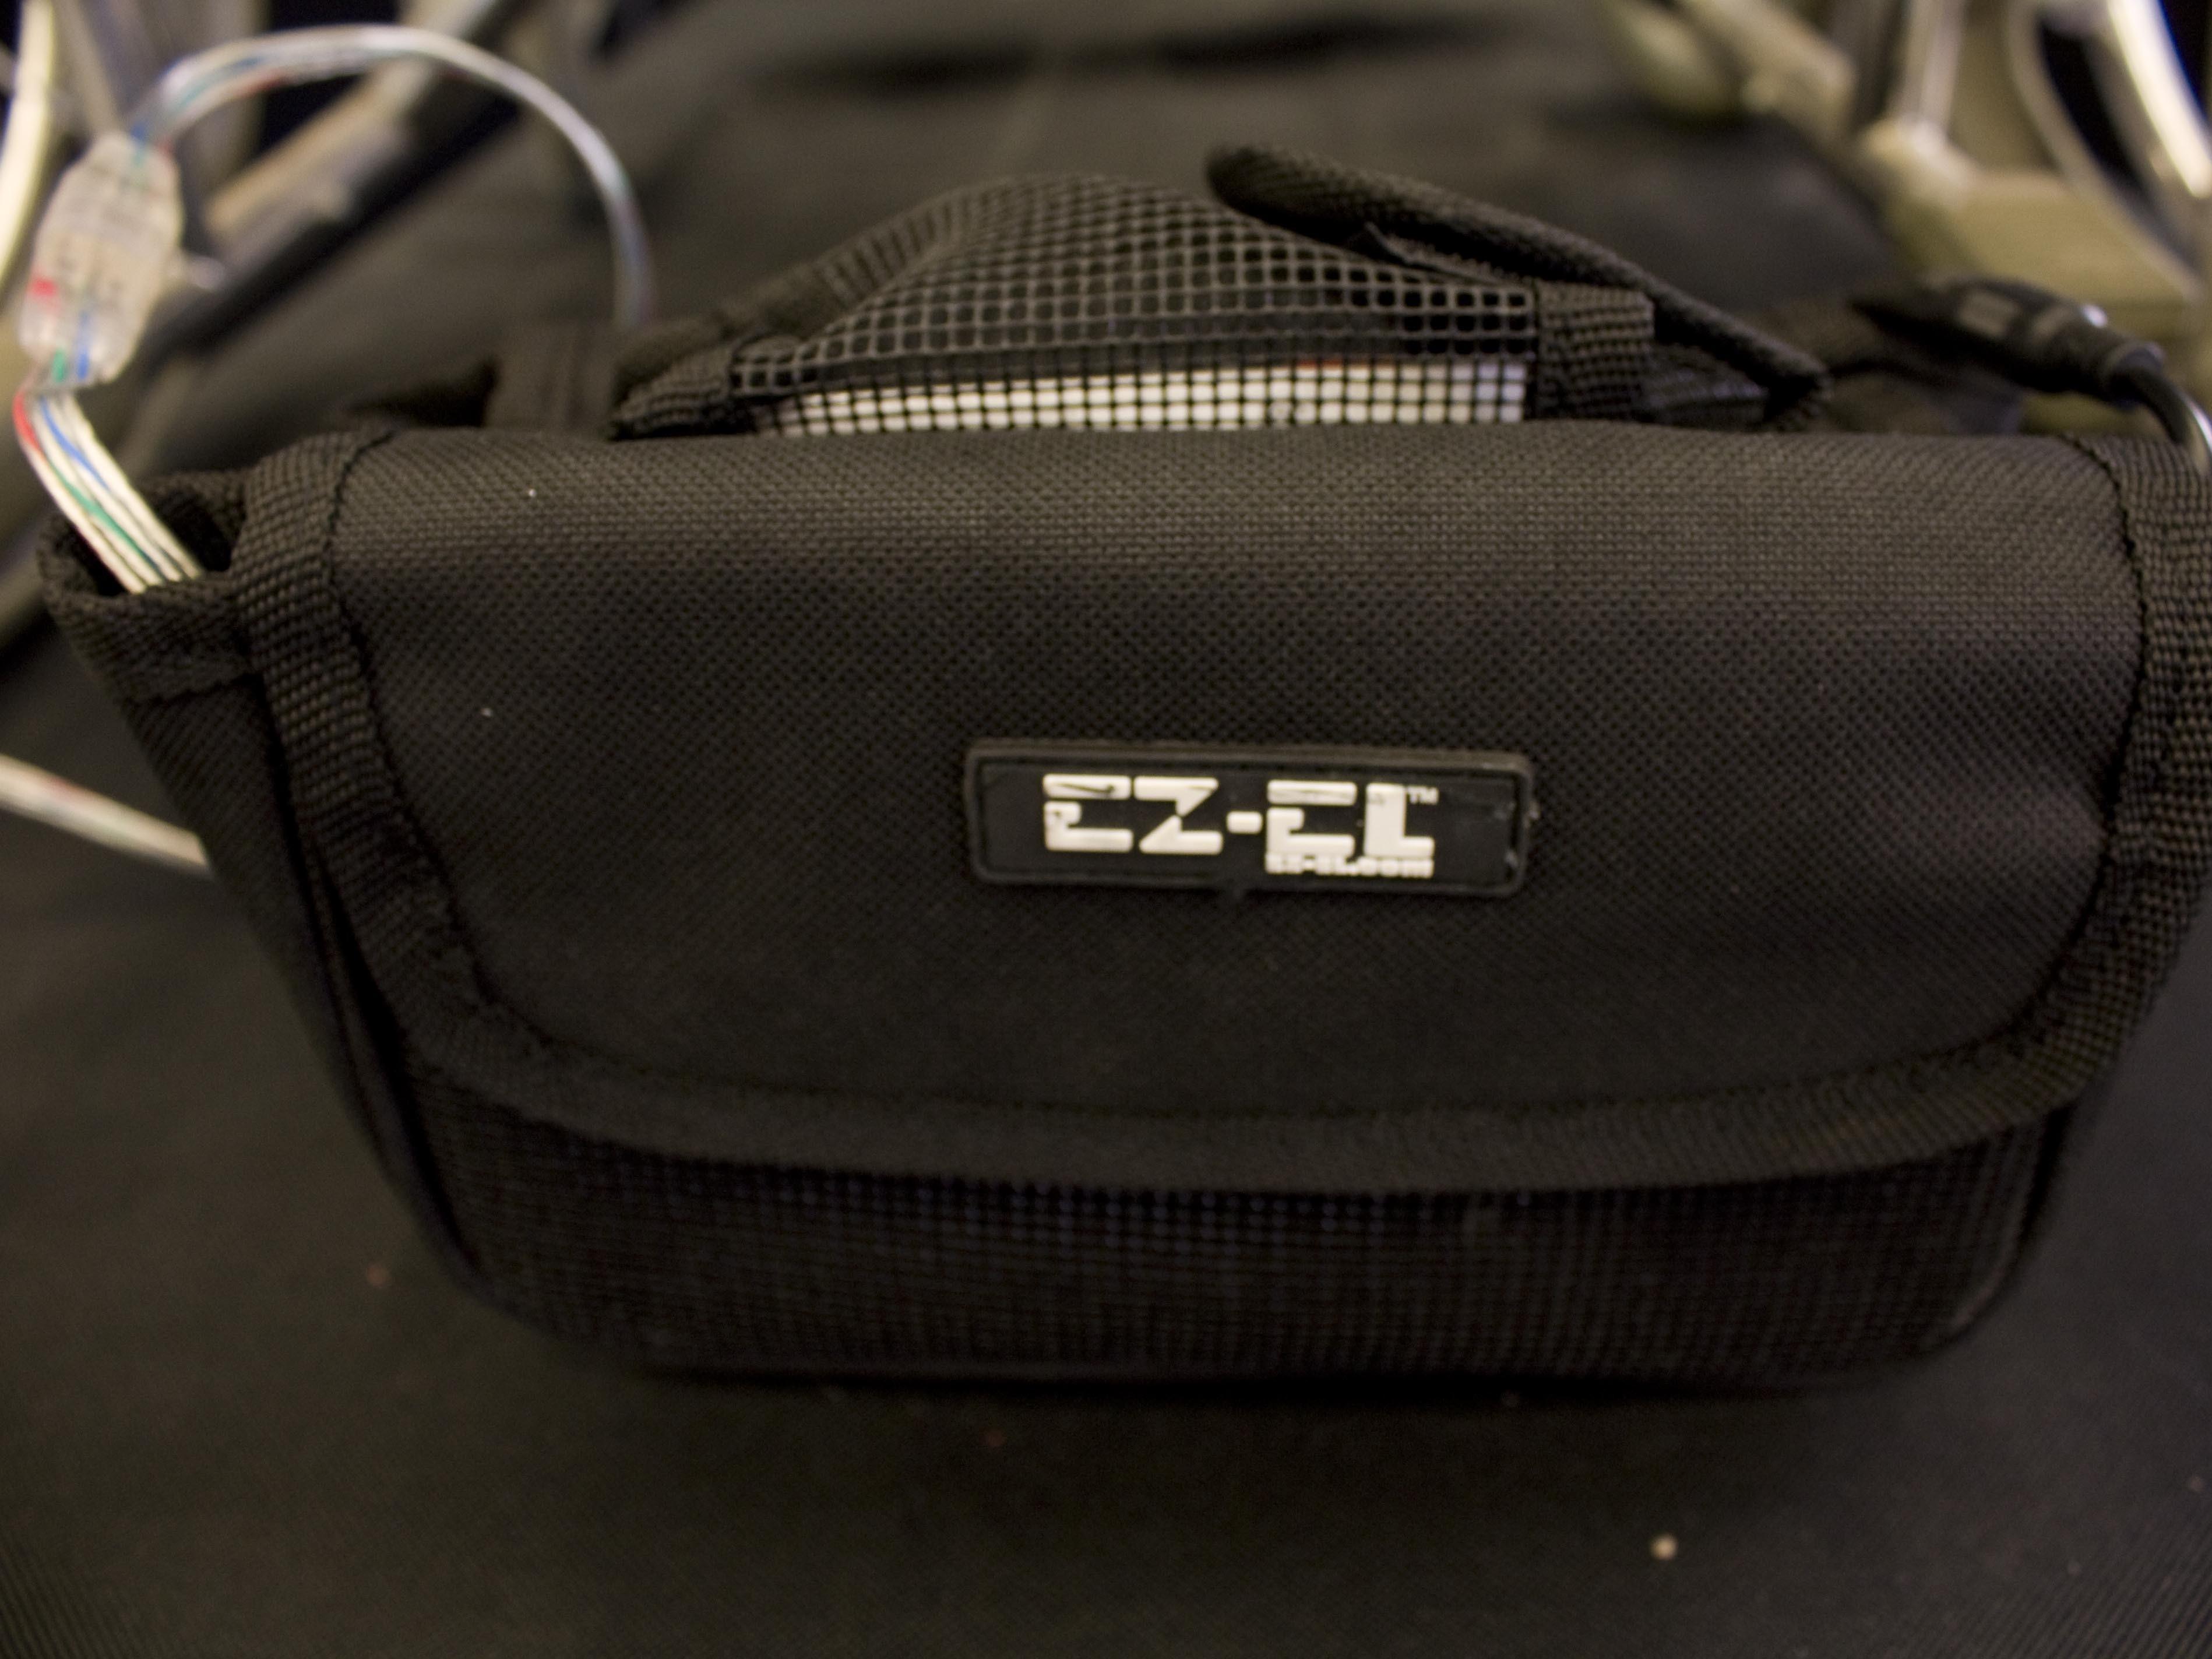 EZ-EL Wire/LED LightWheelchair